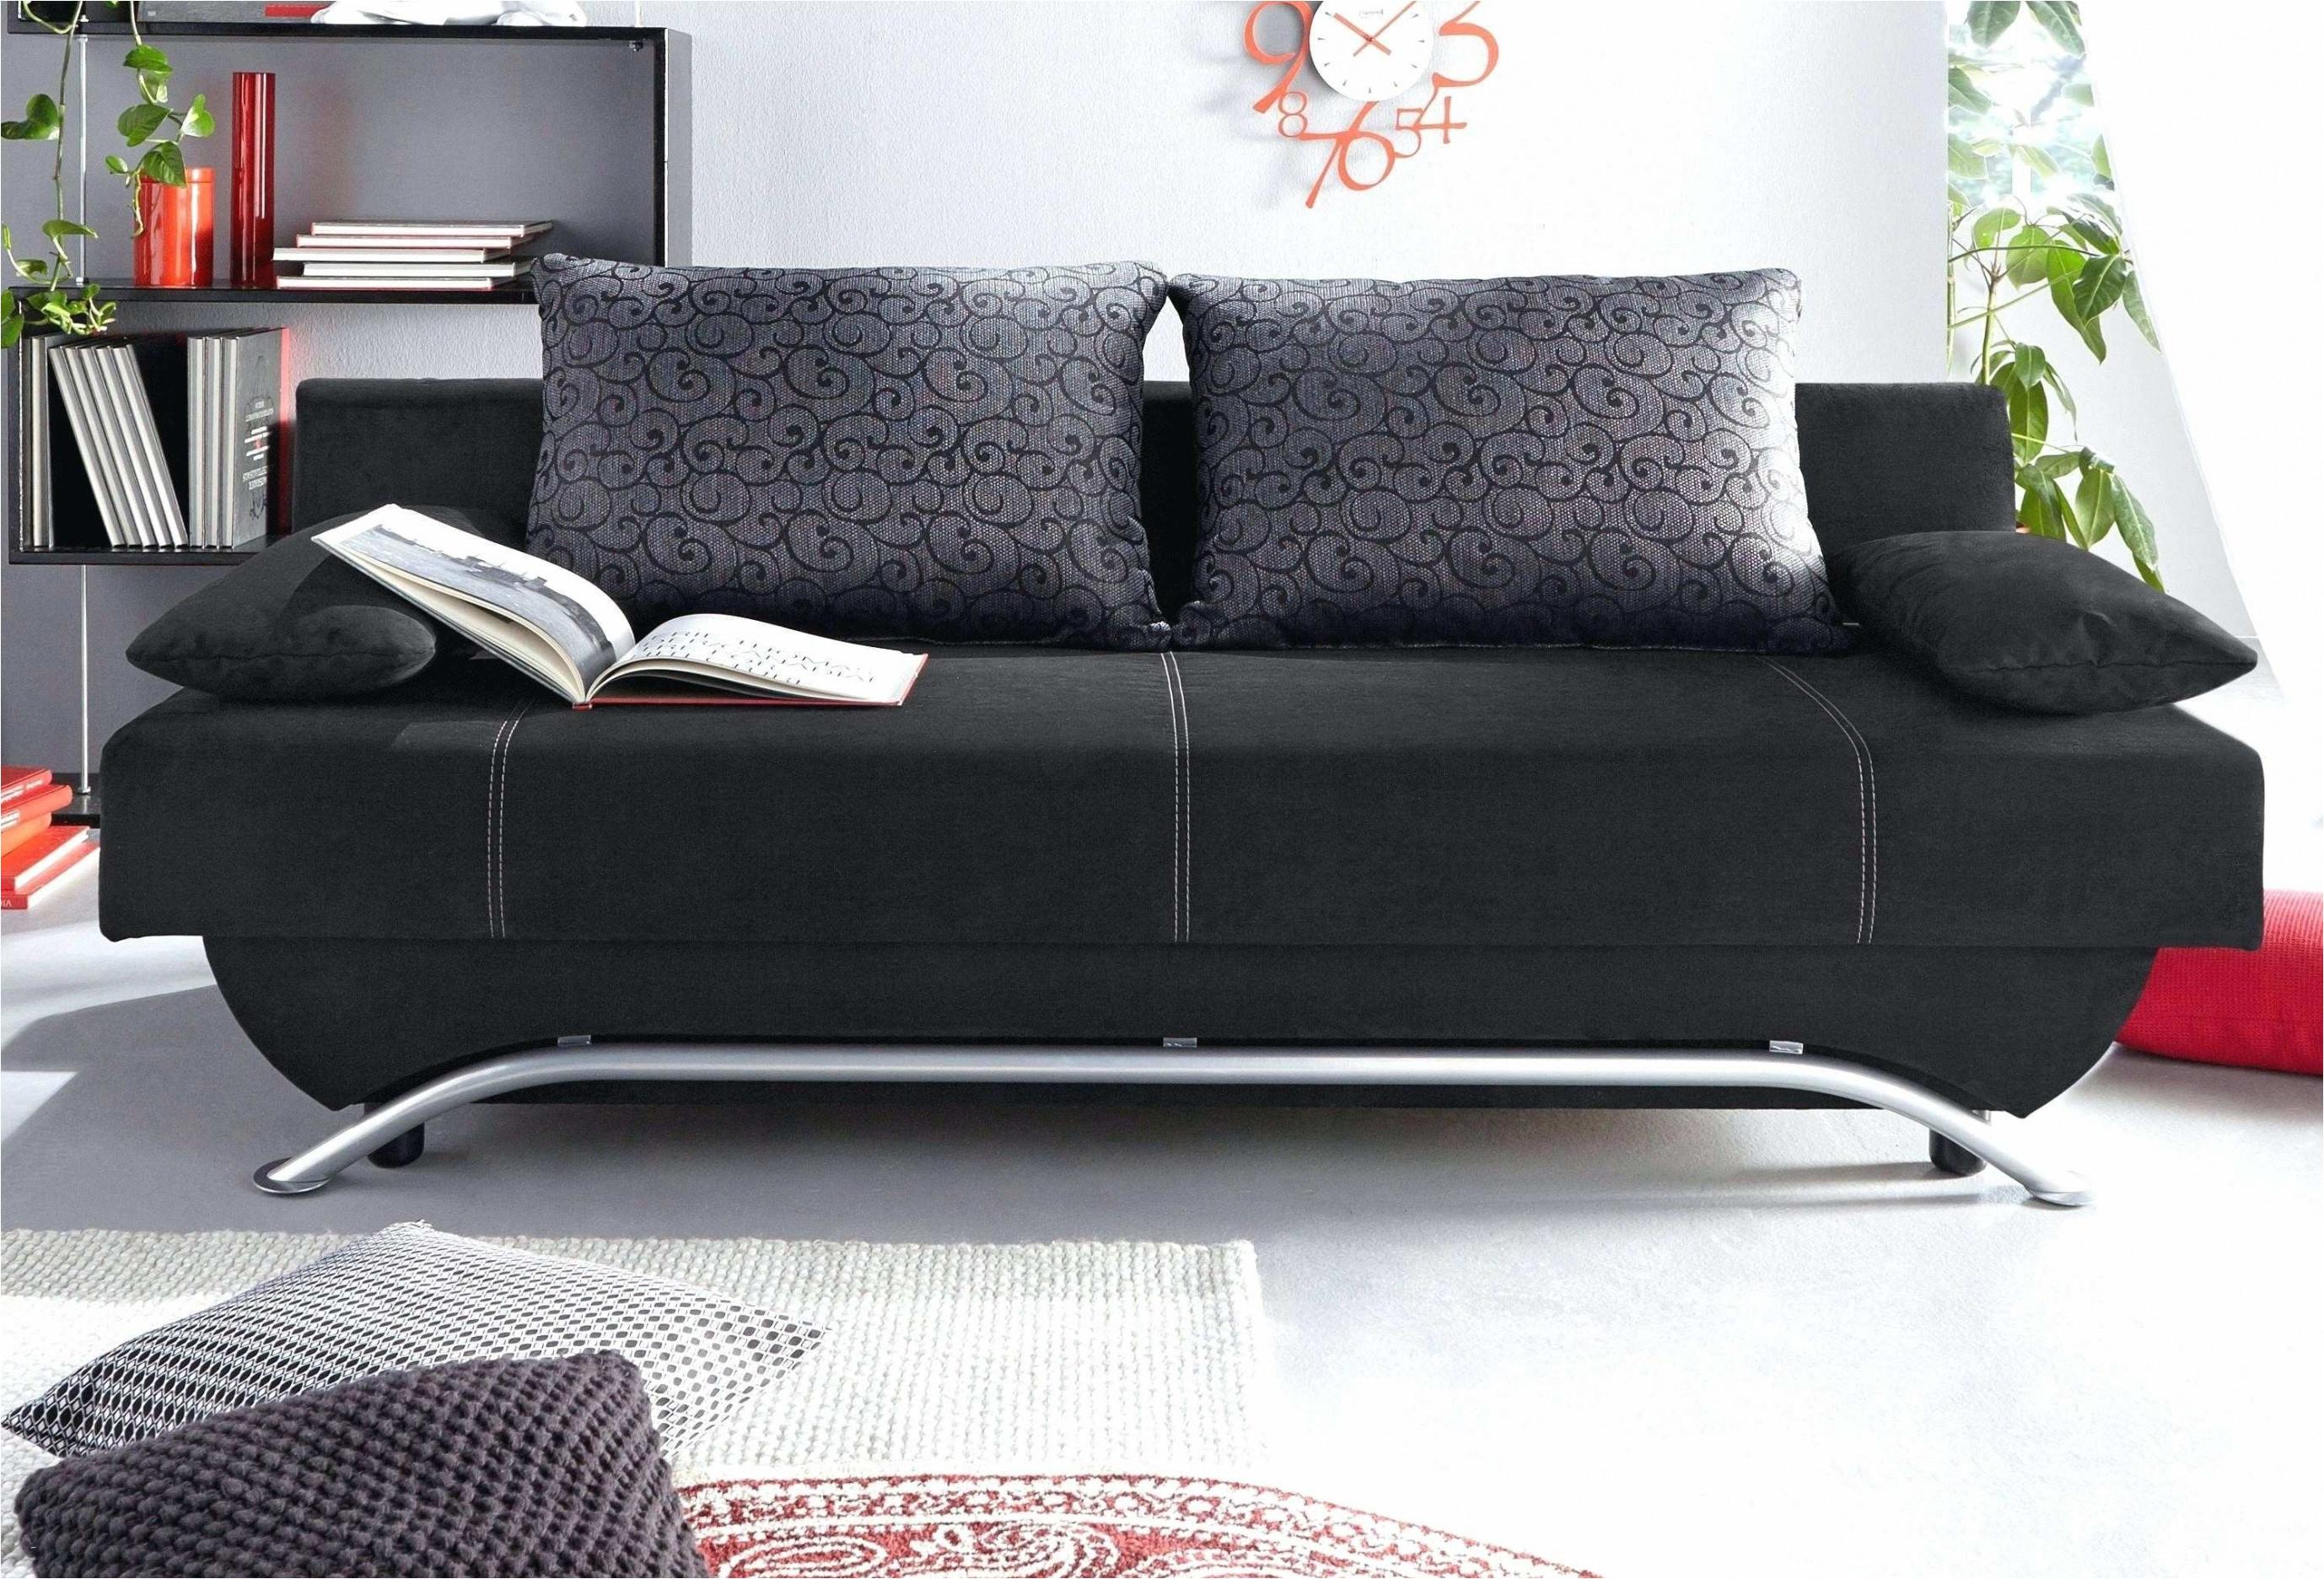 ikea fundas para sofas impresionante best denim sofa ikea luxurypictures